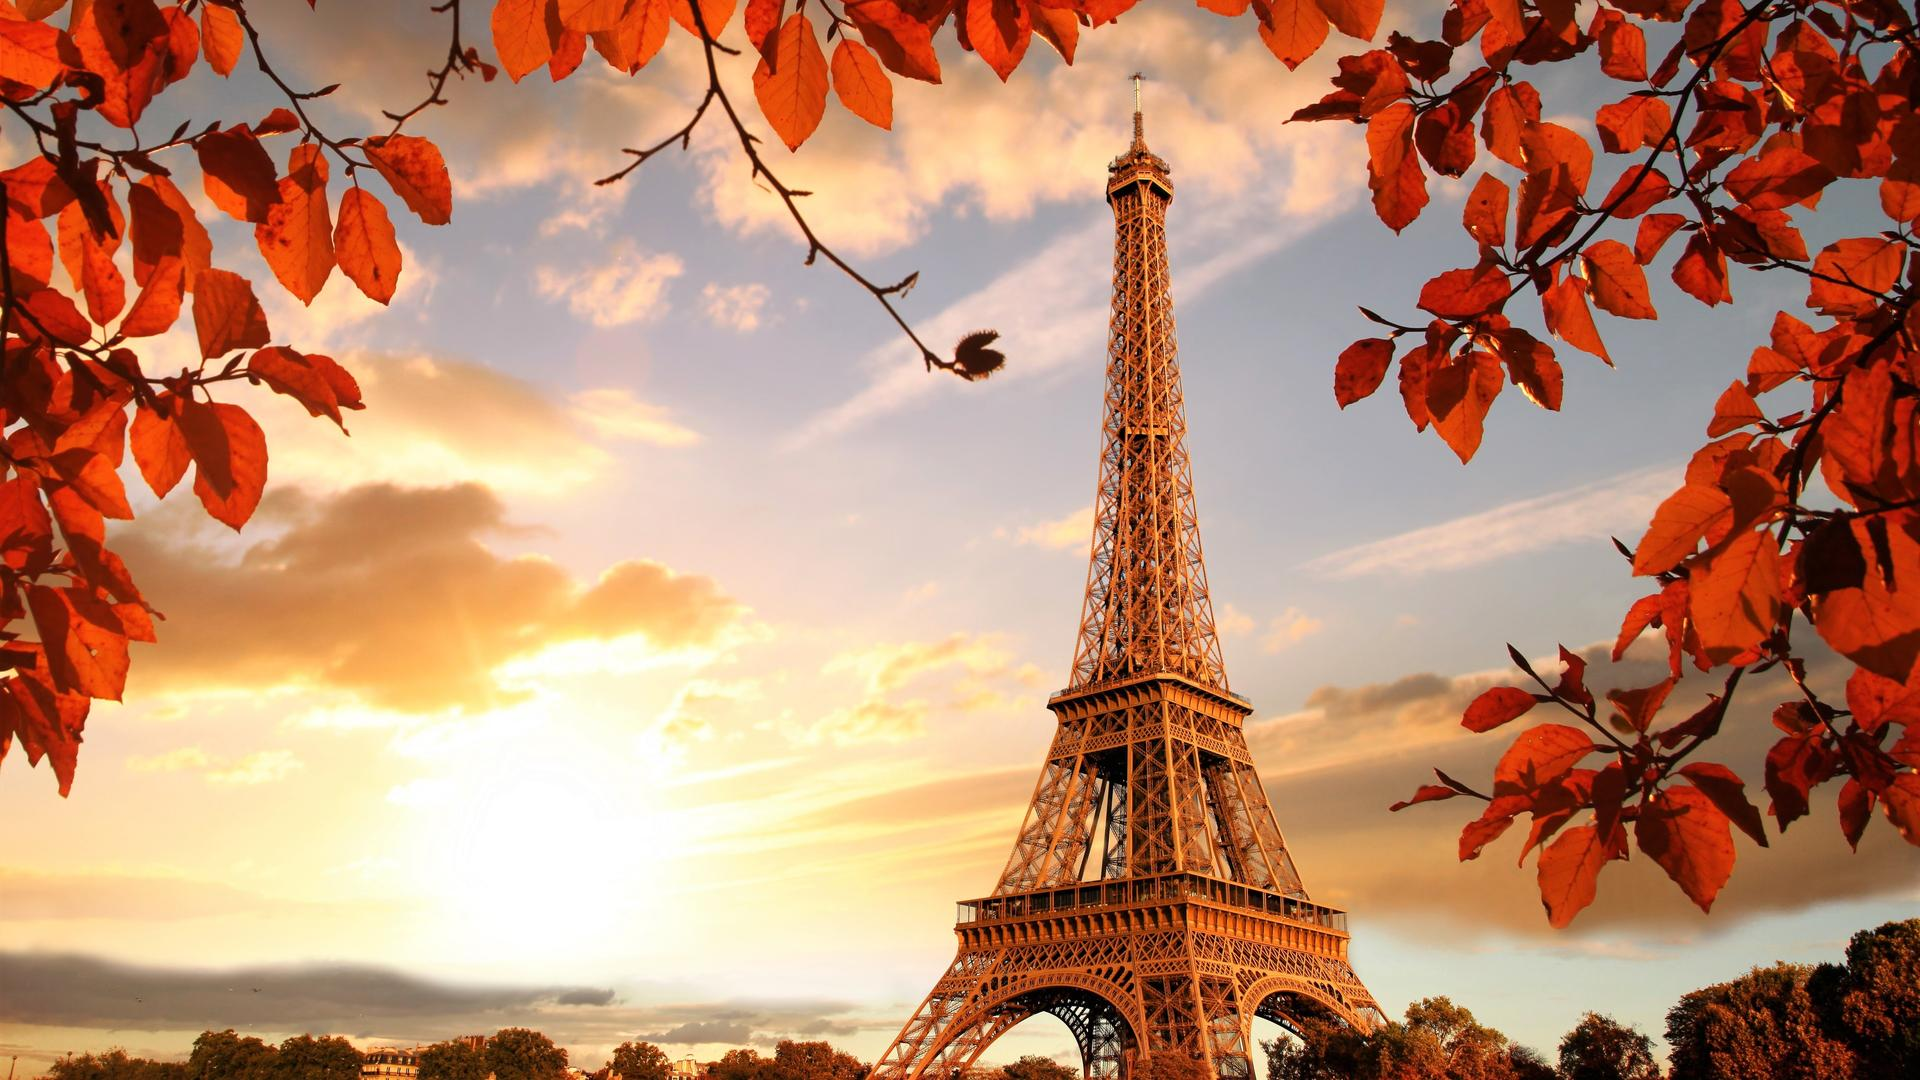 Paris The City Of Love Beautiful Sunrise In Autumn Season